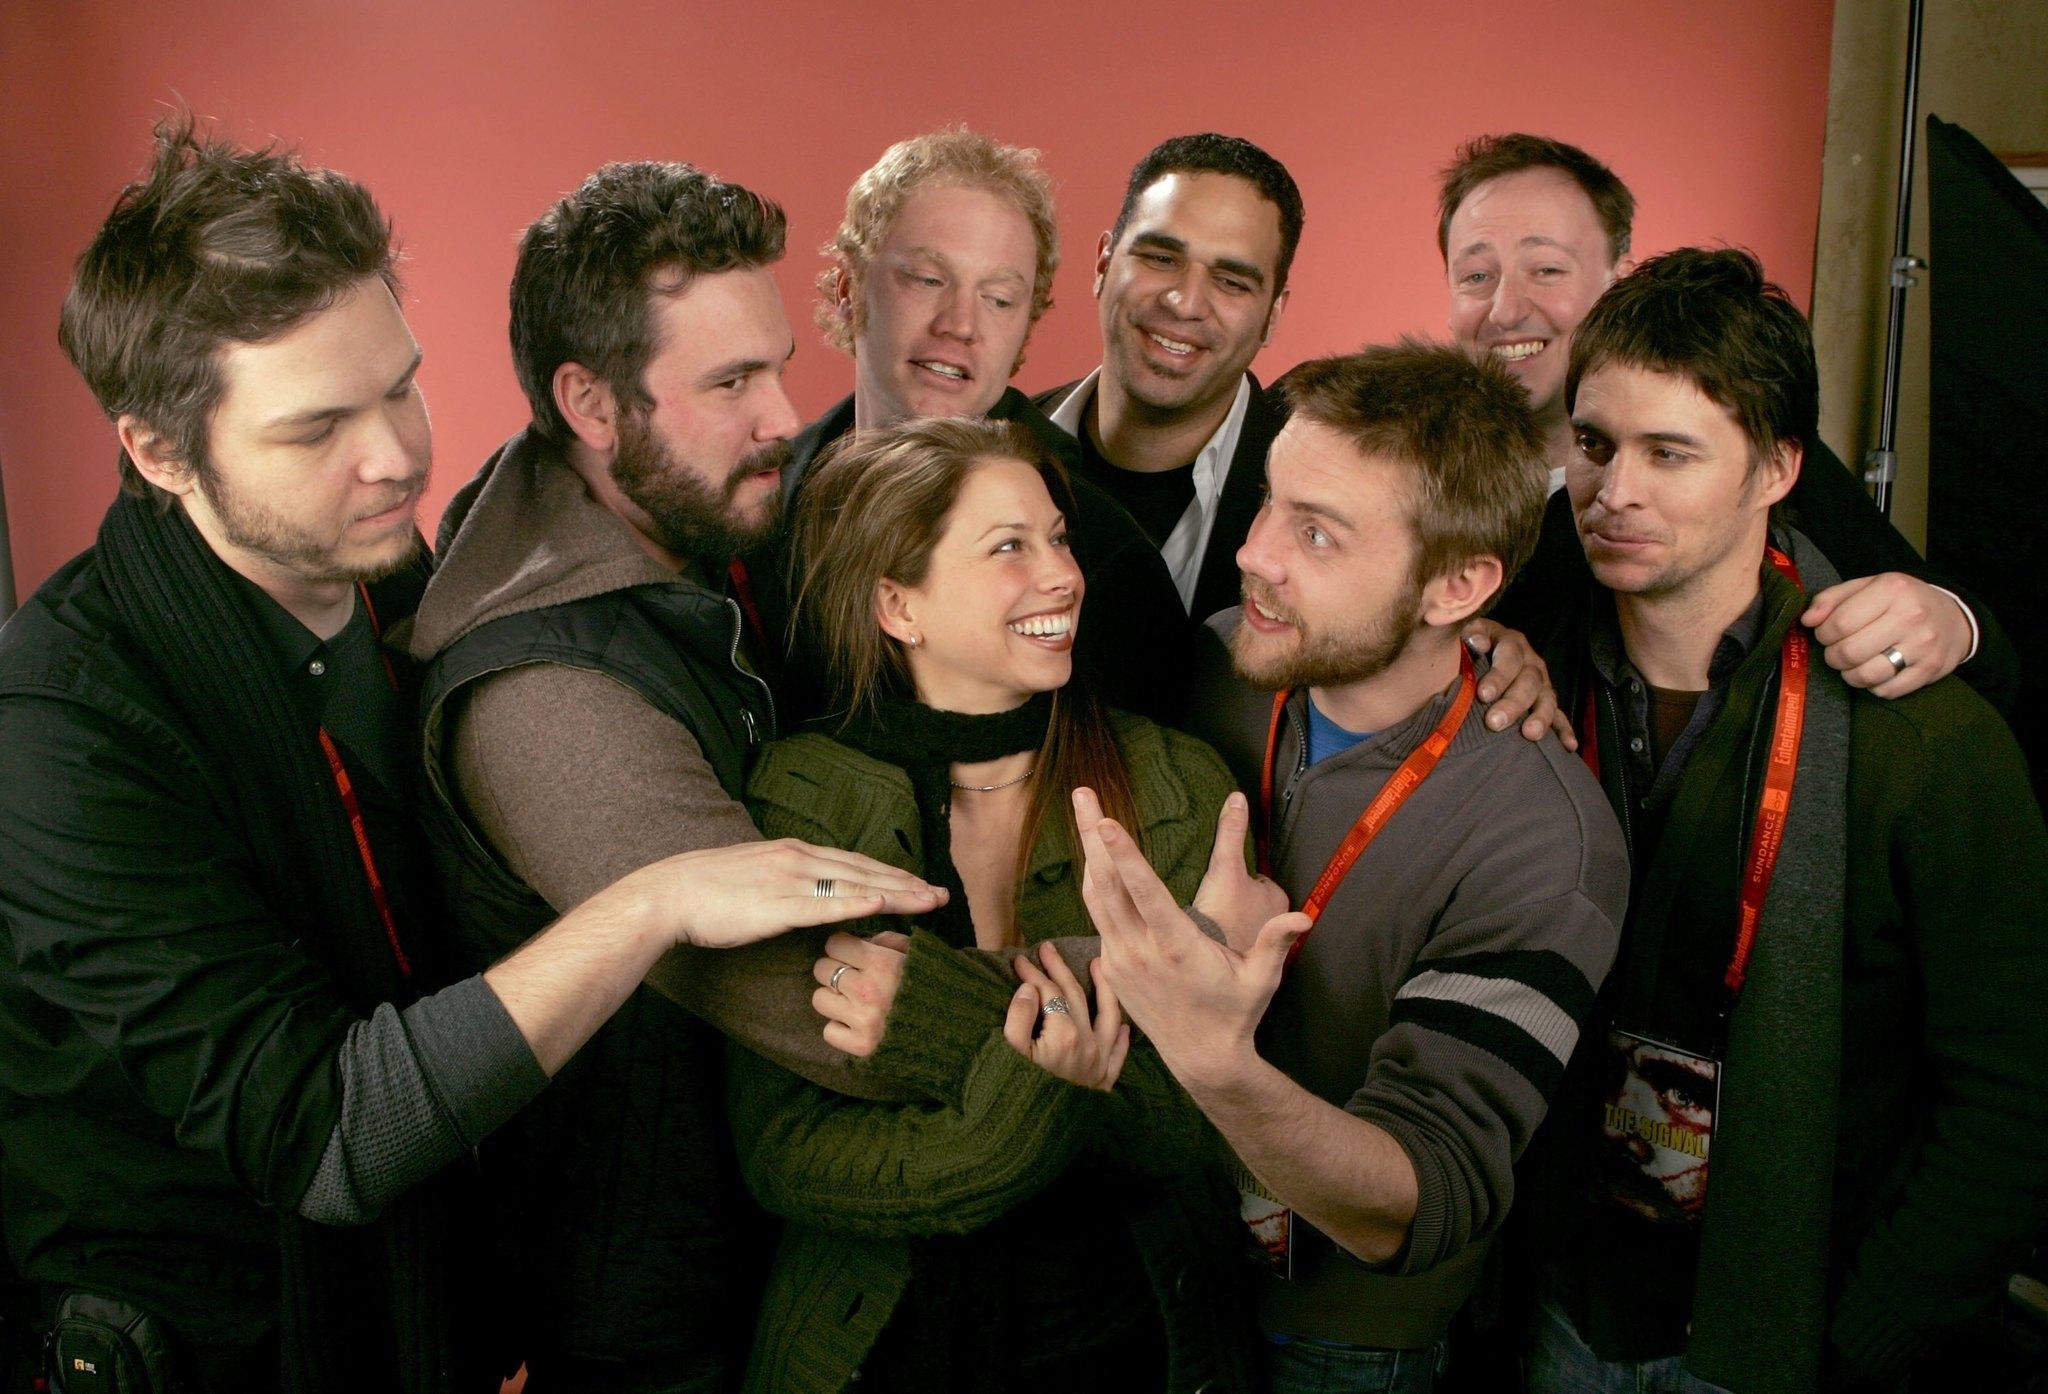 Dan Bush, Chad McKnight, Cheri Christian, Jacob Gentry, Alexander Motlagh, Scott Poythress, AJ Bowen, and David Bruckner